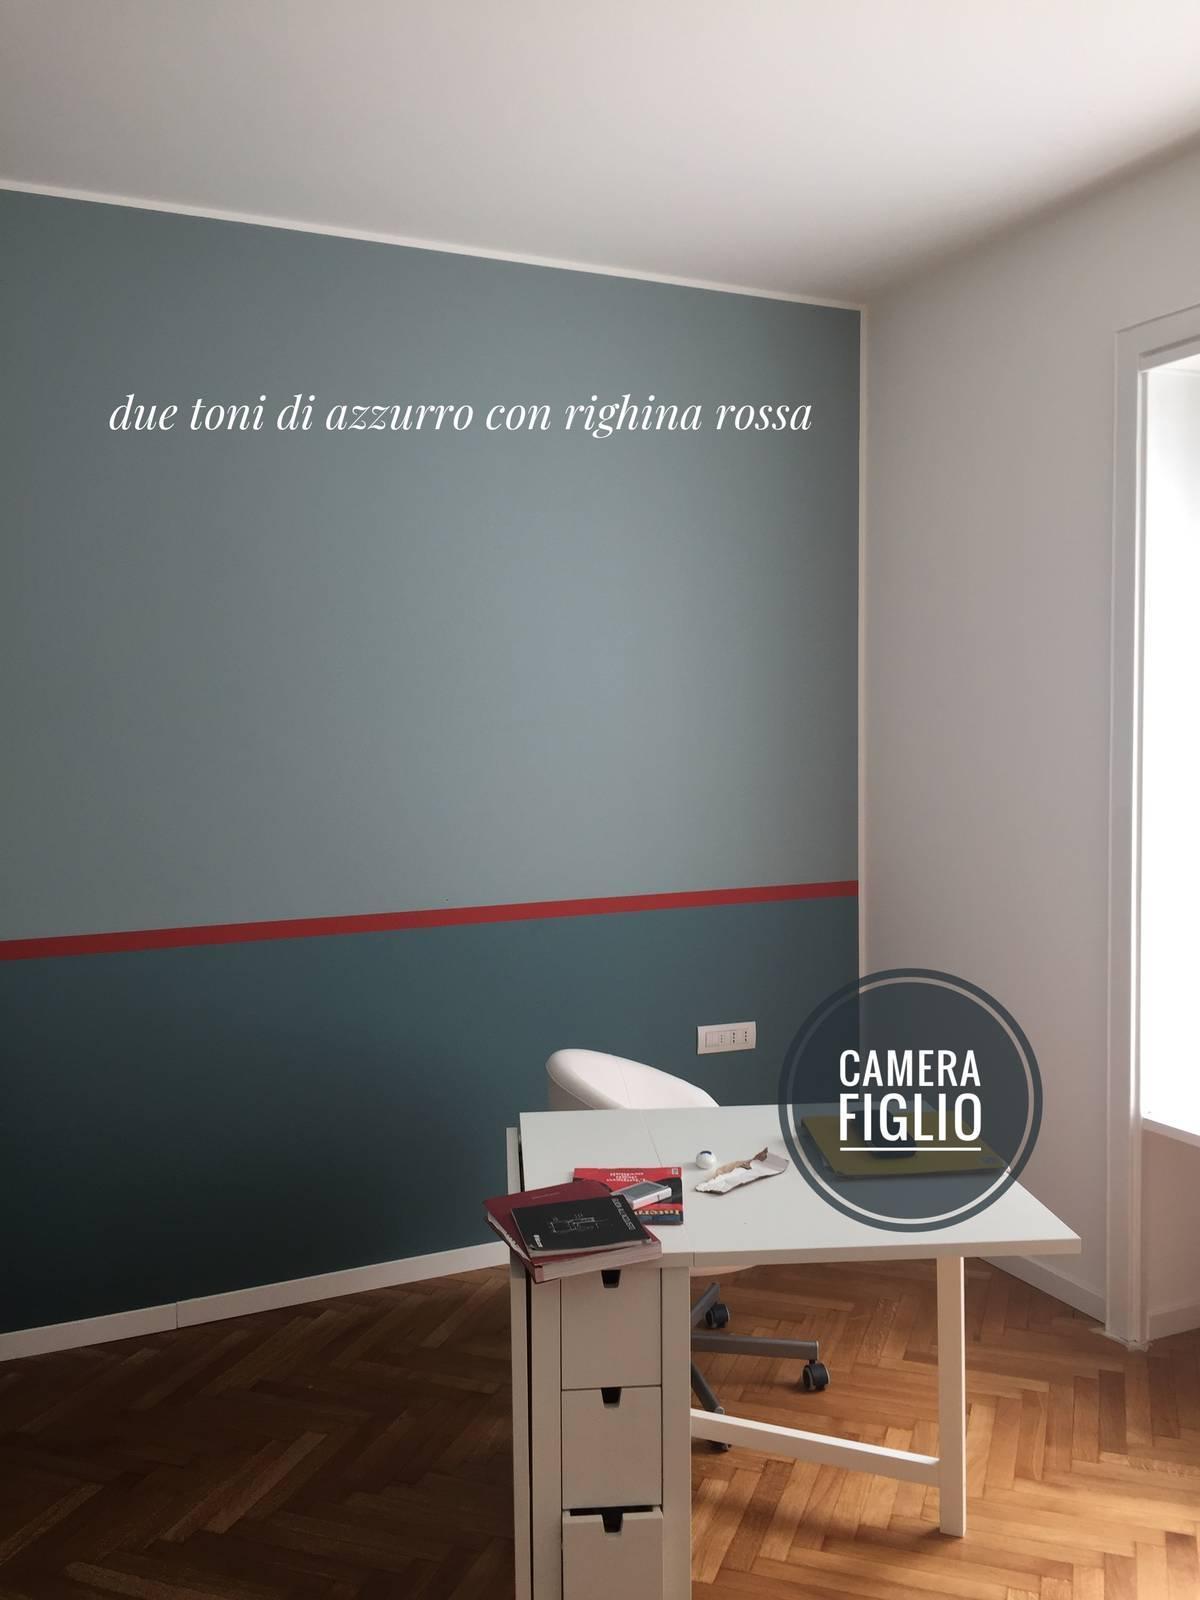 Nuove Pitture Per Appartamenti pitture per le pareti: quali colori? - cose di casa